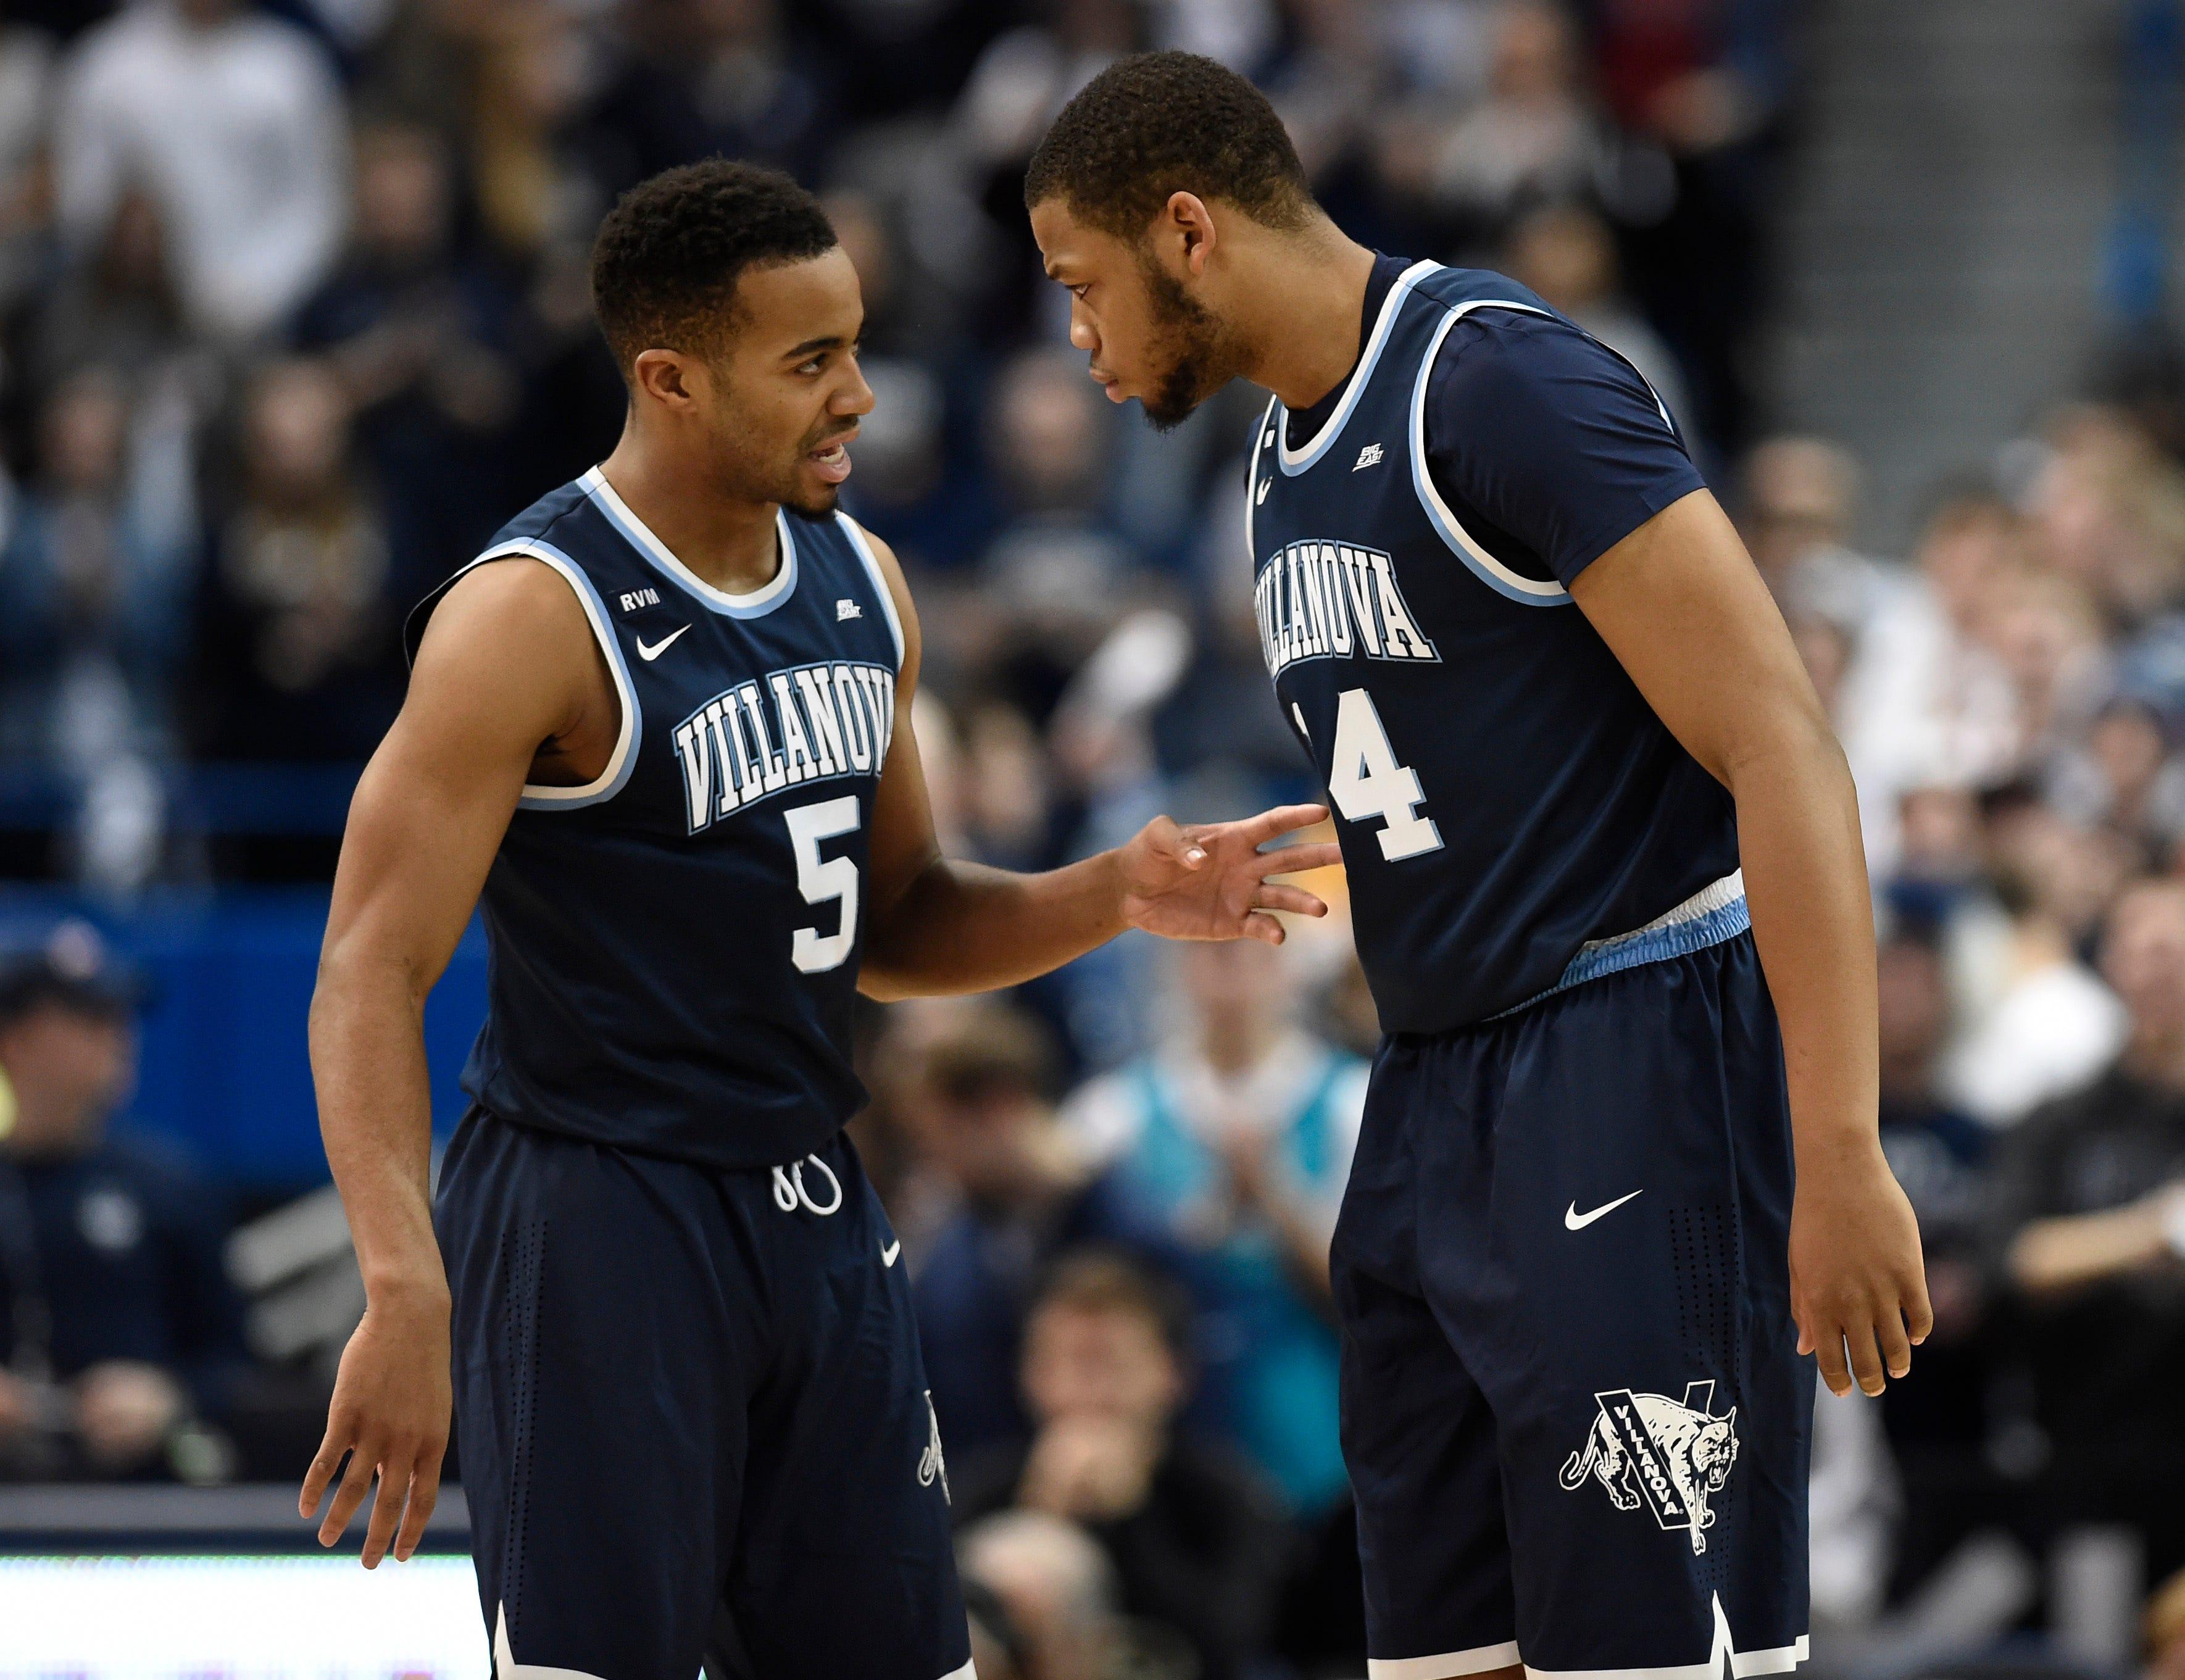 Villanova keeps hold of No. 1 spot in USA TODAY Sports men's basketball poll